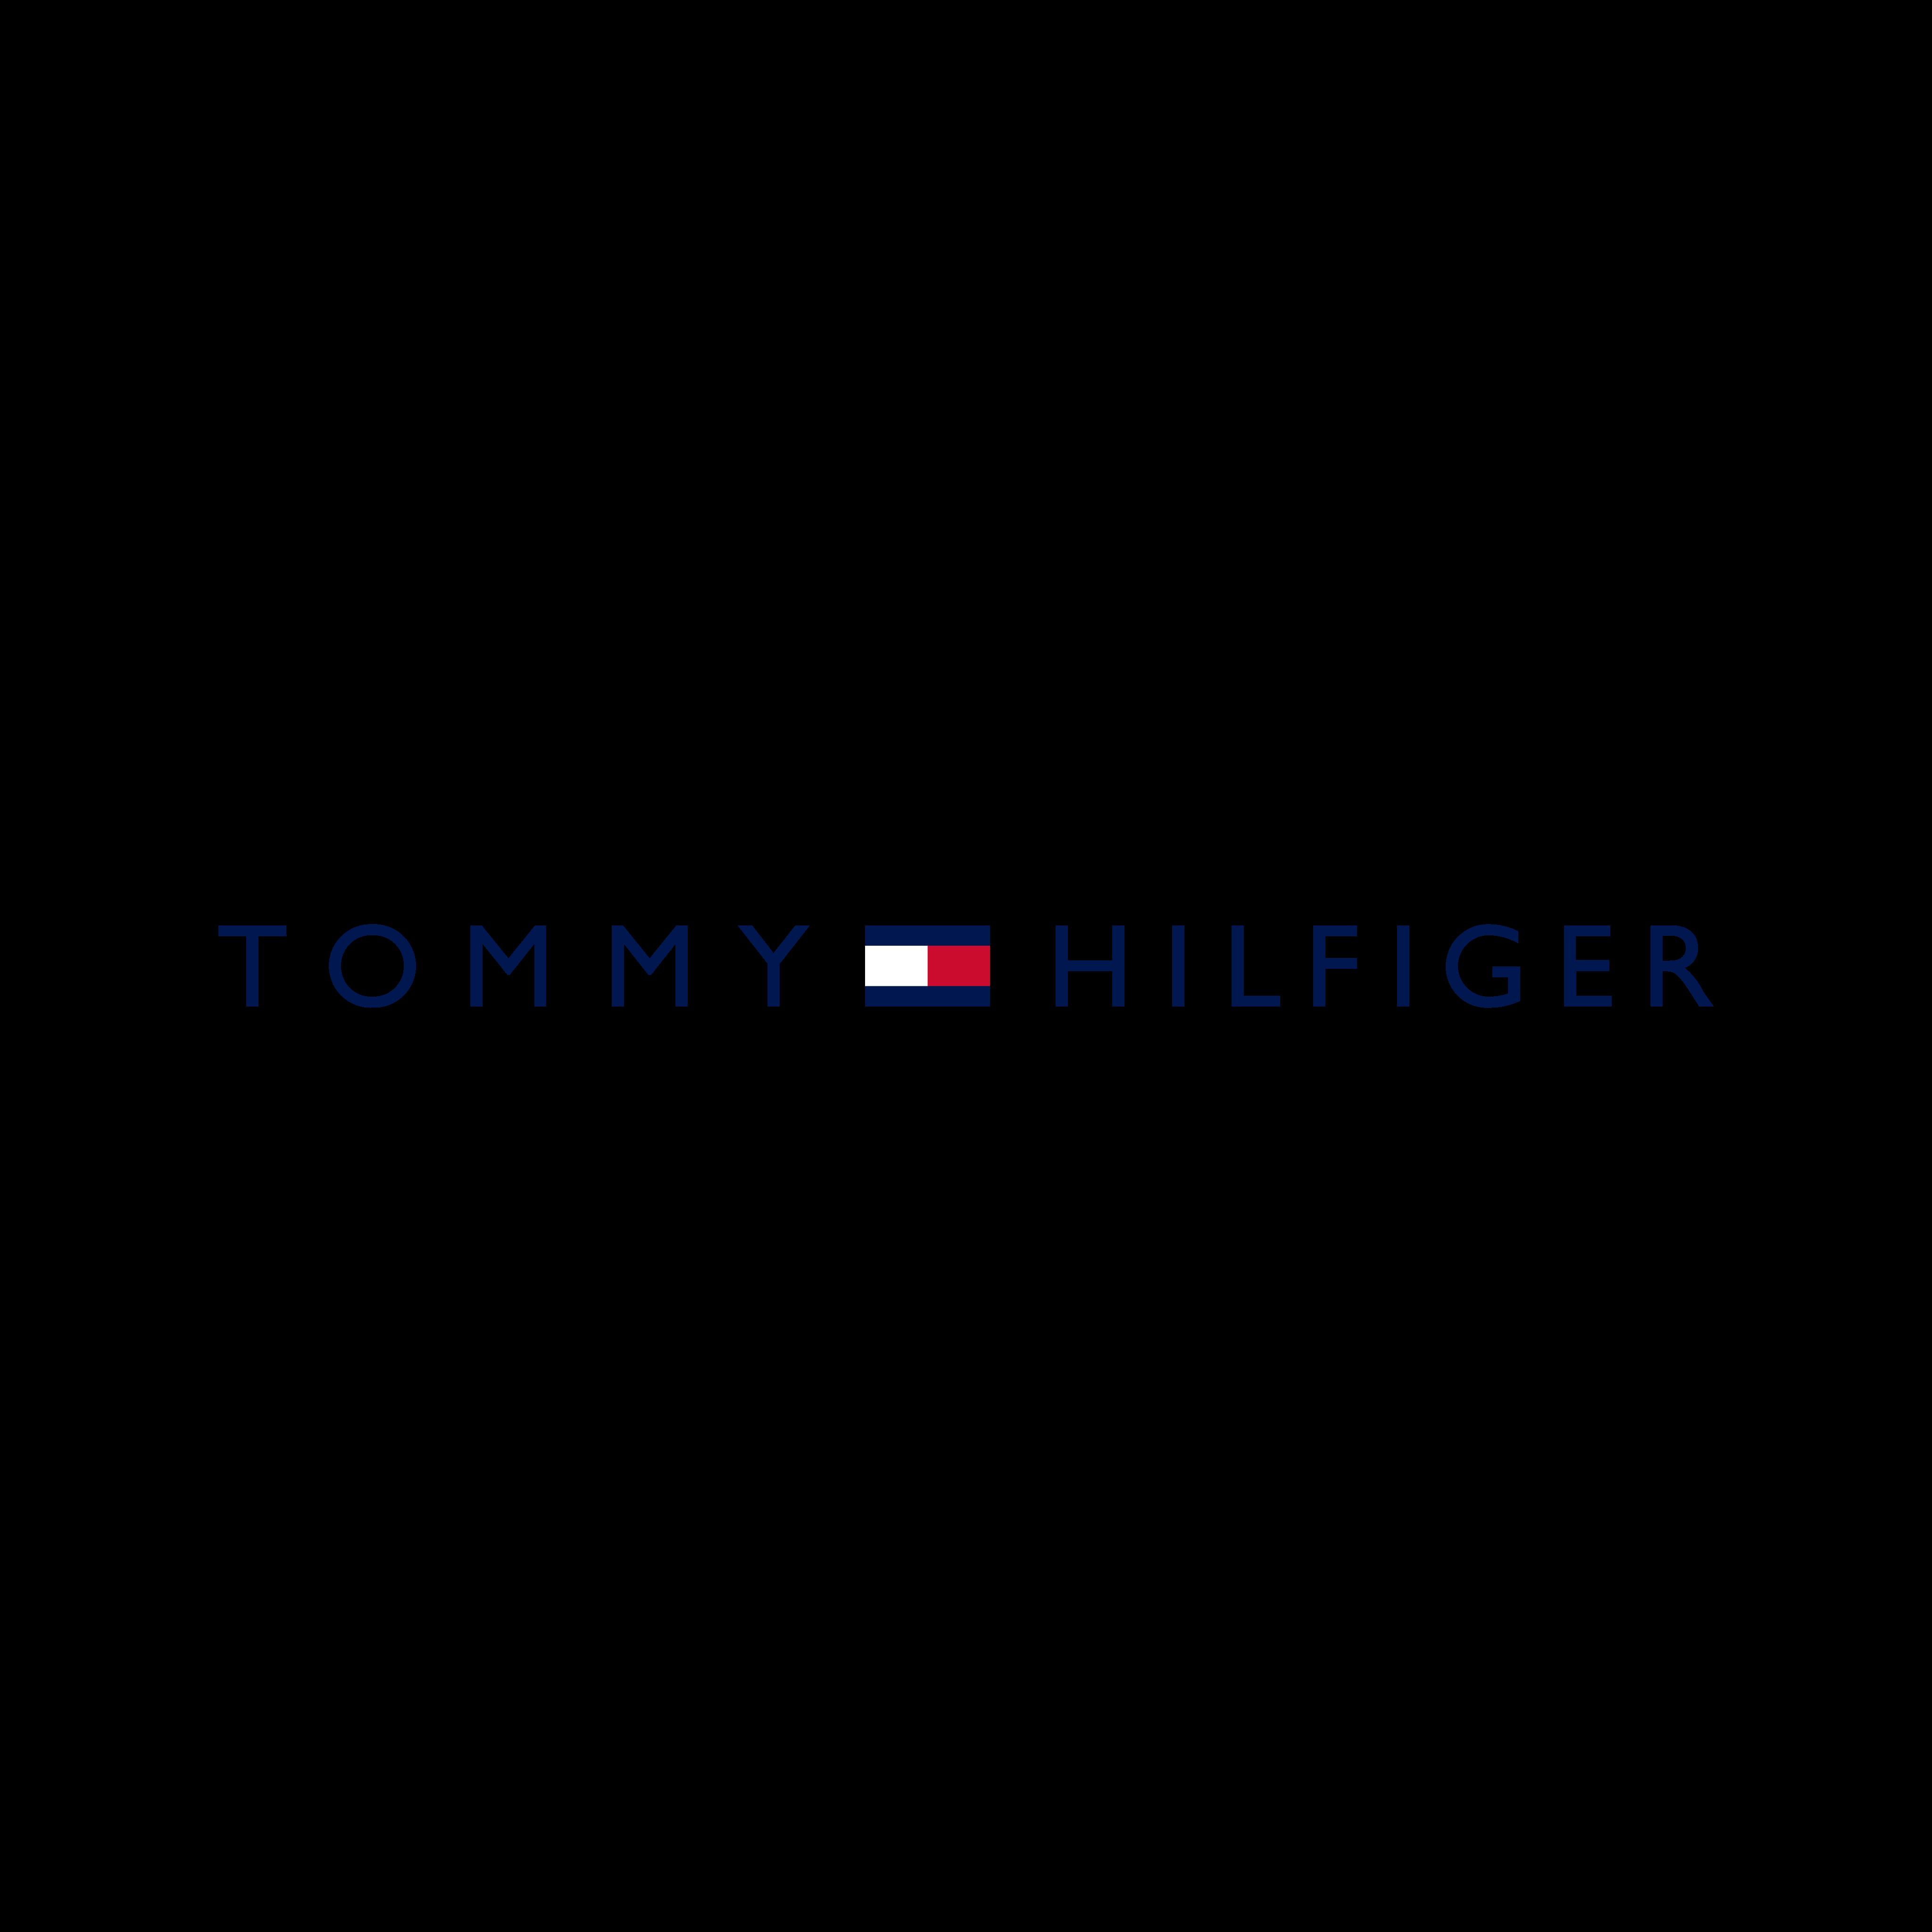 tommy hilfiger 0 - Tommy Hilfiger Logo